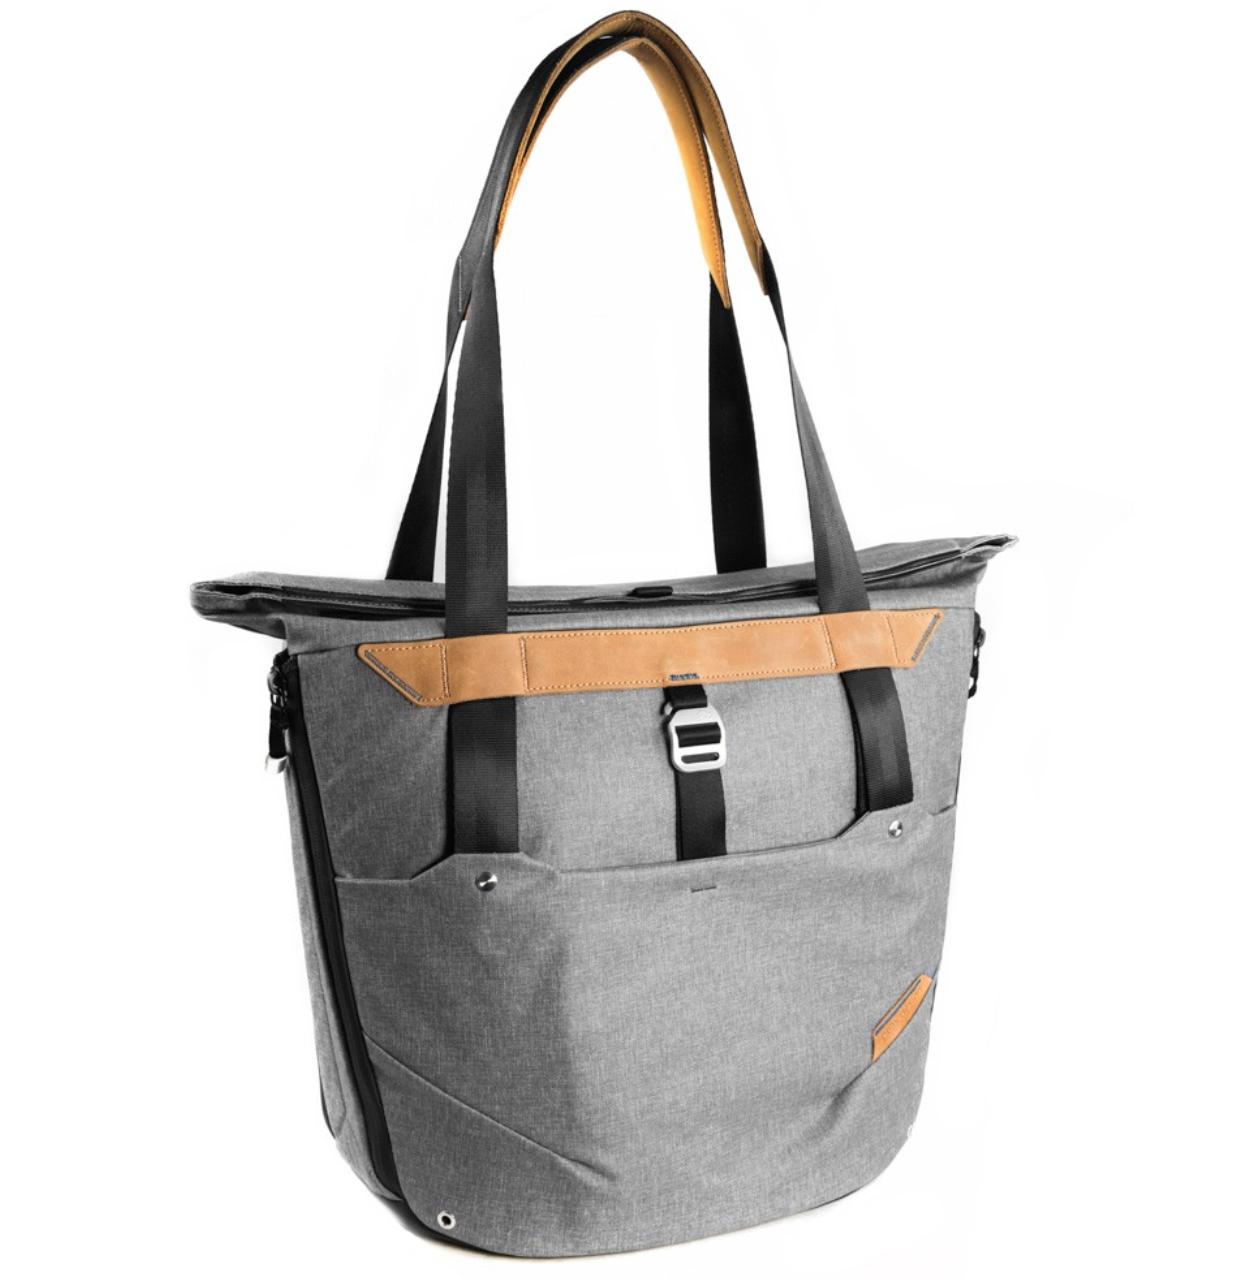 Everyday Tote Bag via  Peak Design  ($189.95)